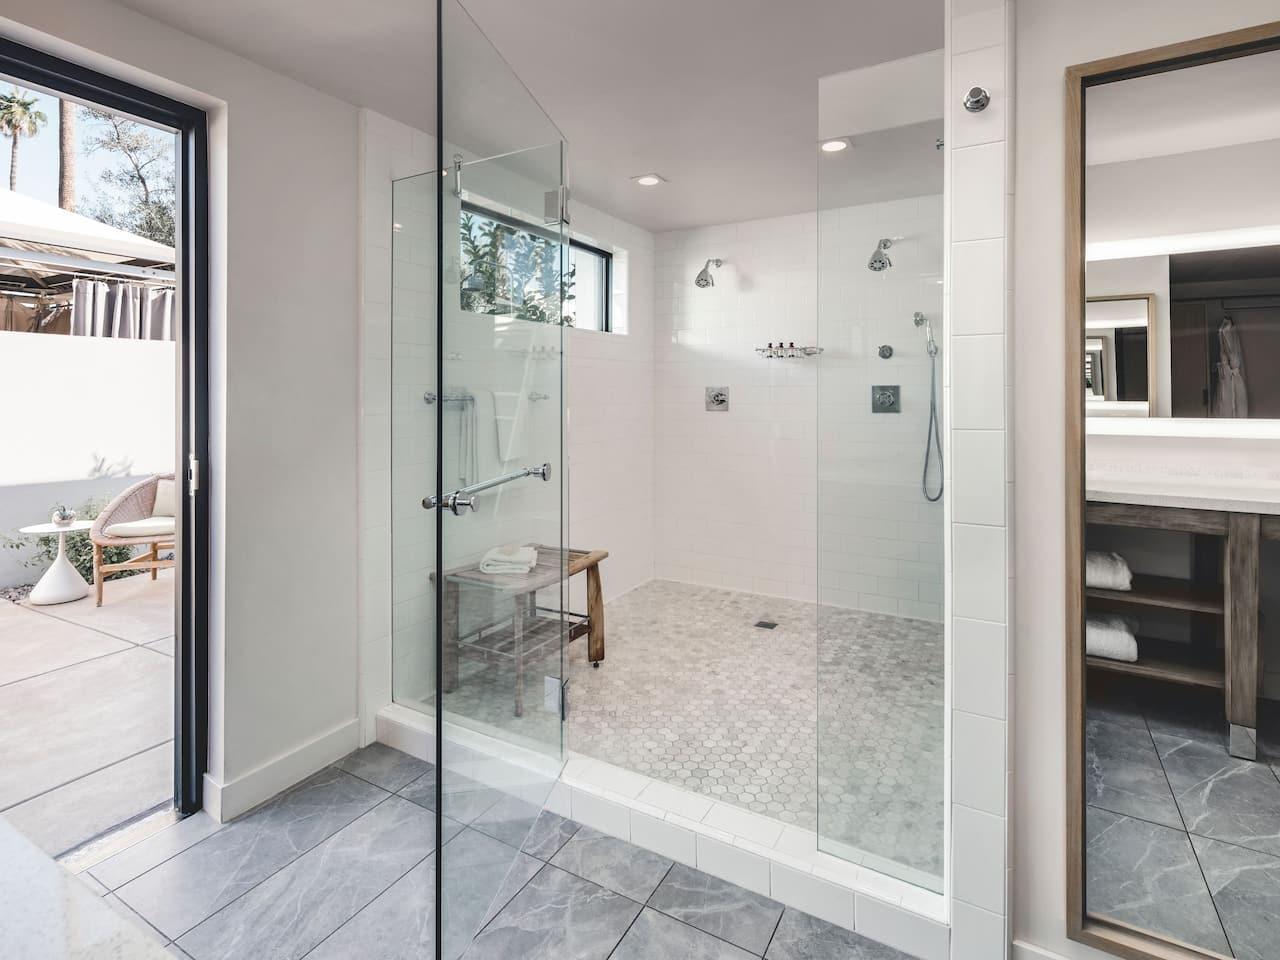 Cabana King Shower